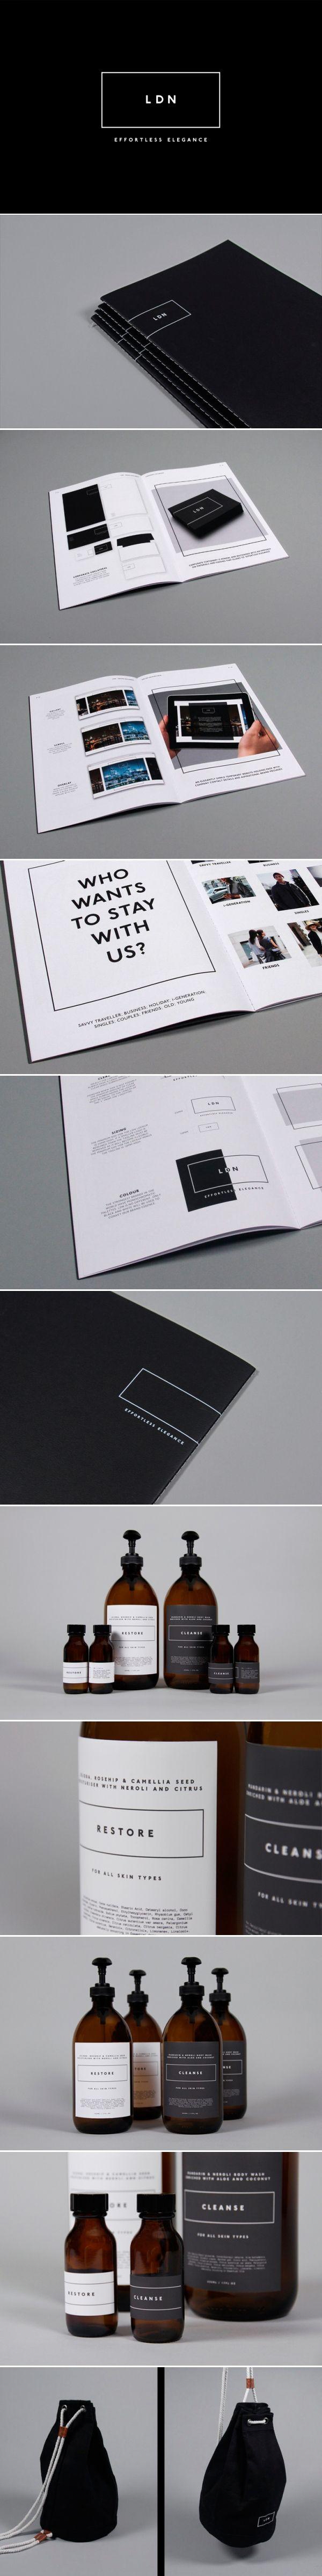 presentation. ldn hotelblacksheep | branding • 牌 | pinterest